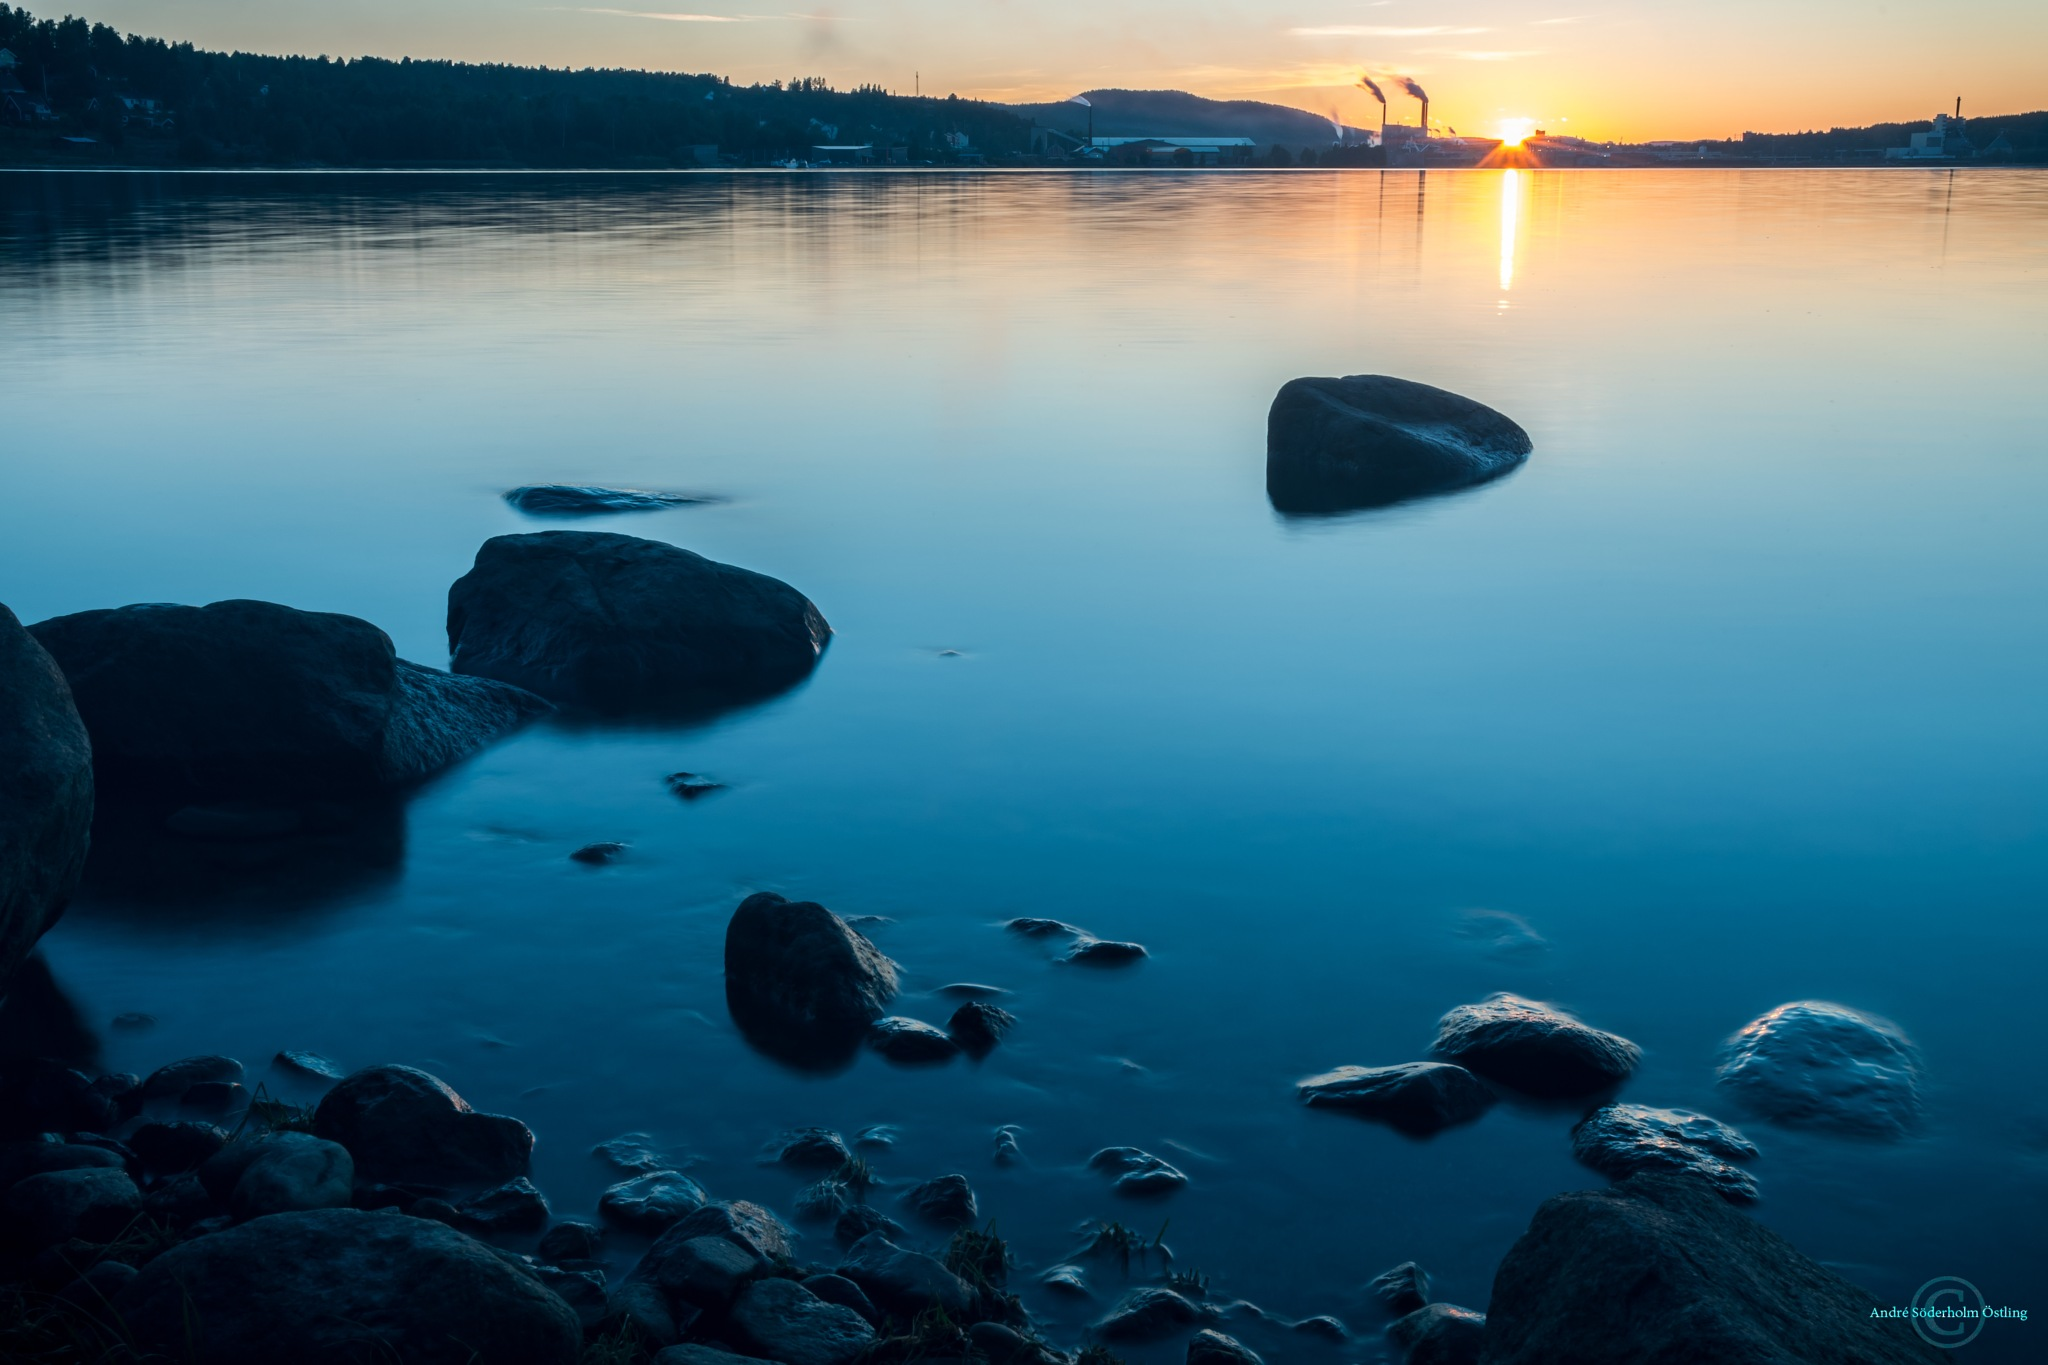 Beautiful sunset at Alne! by André Söderholm Östling